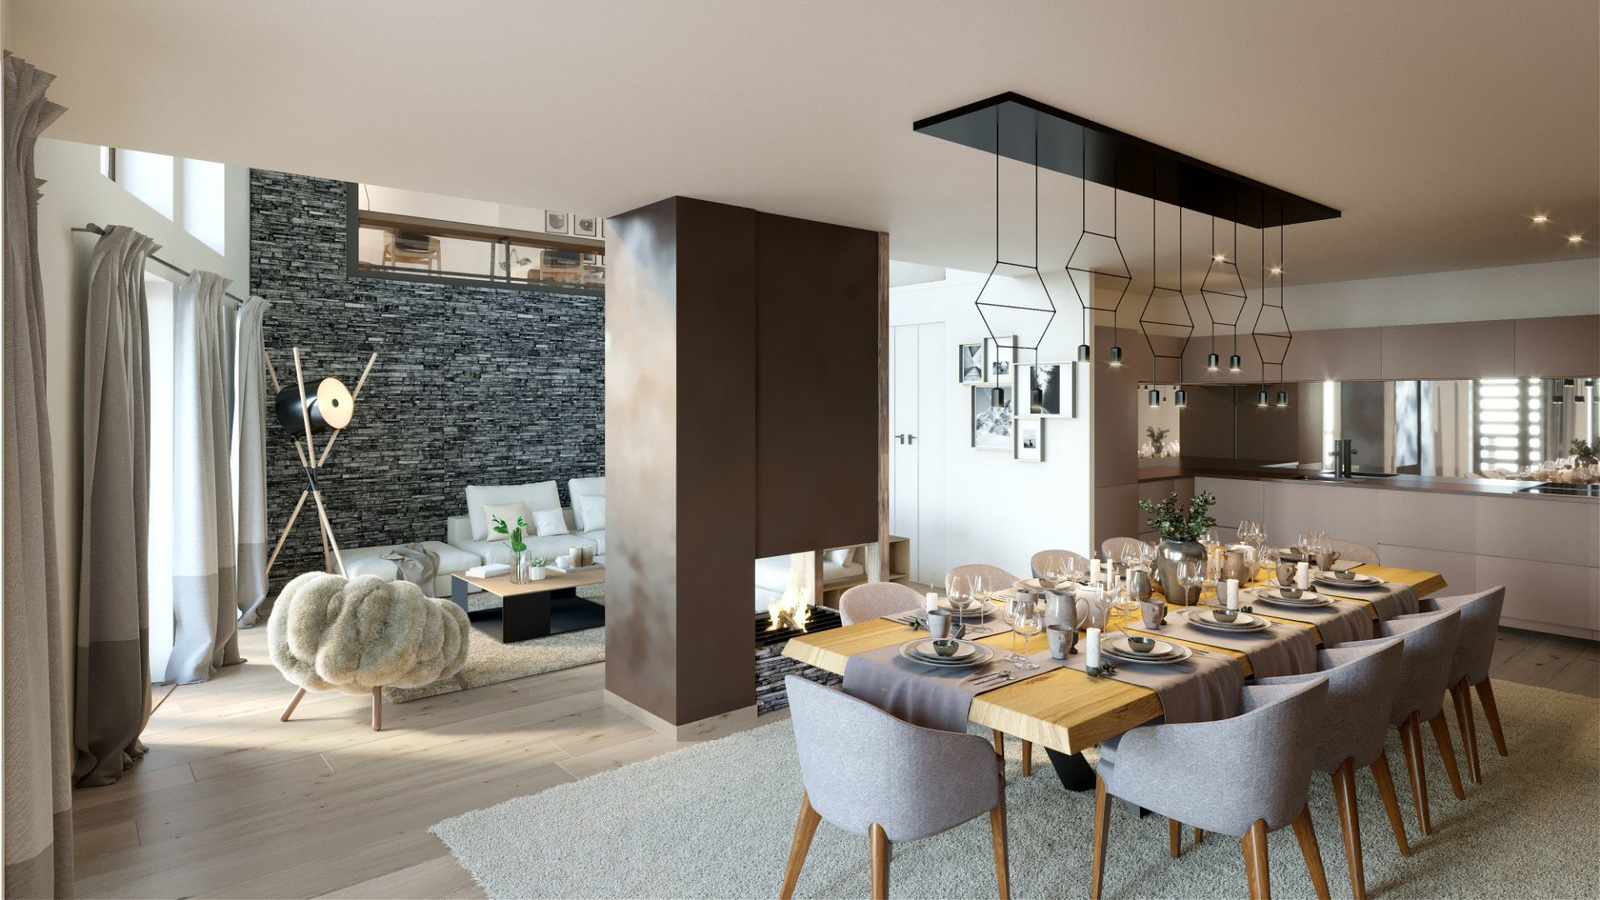 Alpamayor Apartments, France